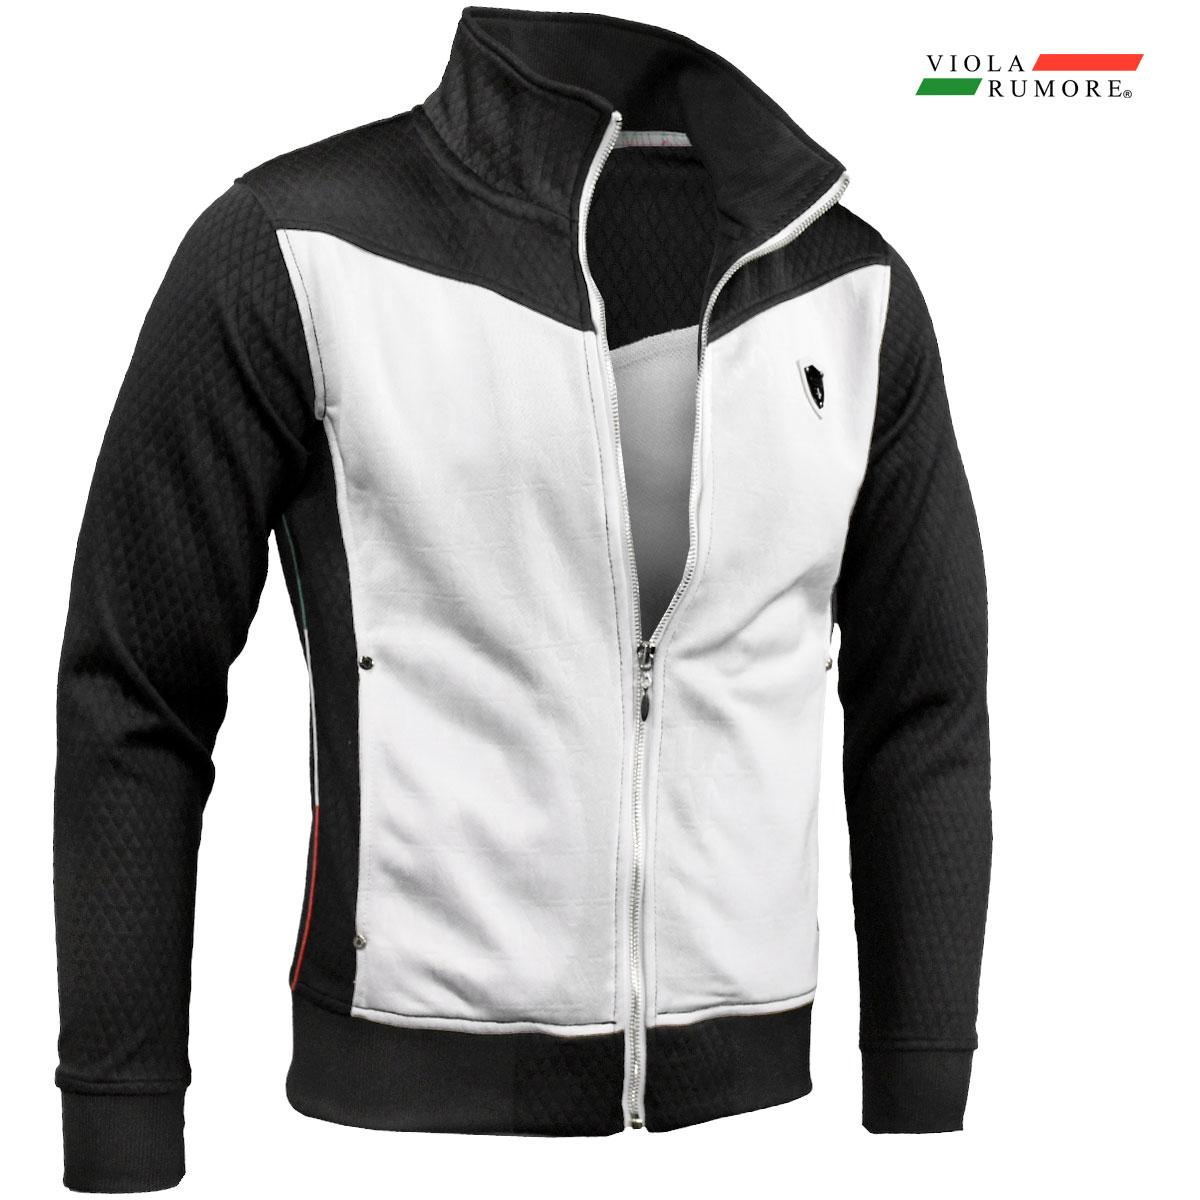 VIOLA rumore ヴィオラ ビオラ ジップアップジャケット メンズ スタンドカラー エンボス 長袖 スウェット mens(ブラック黒ホワイト白)